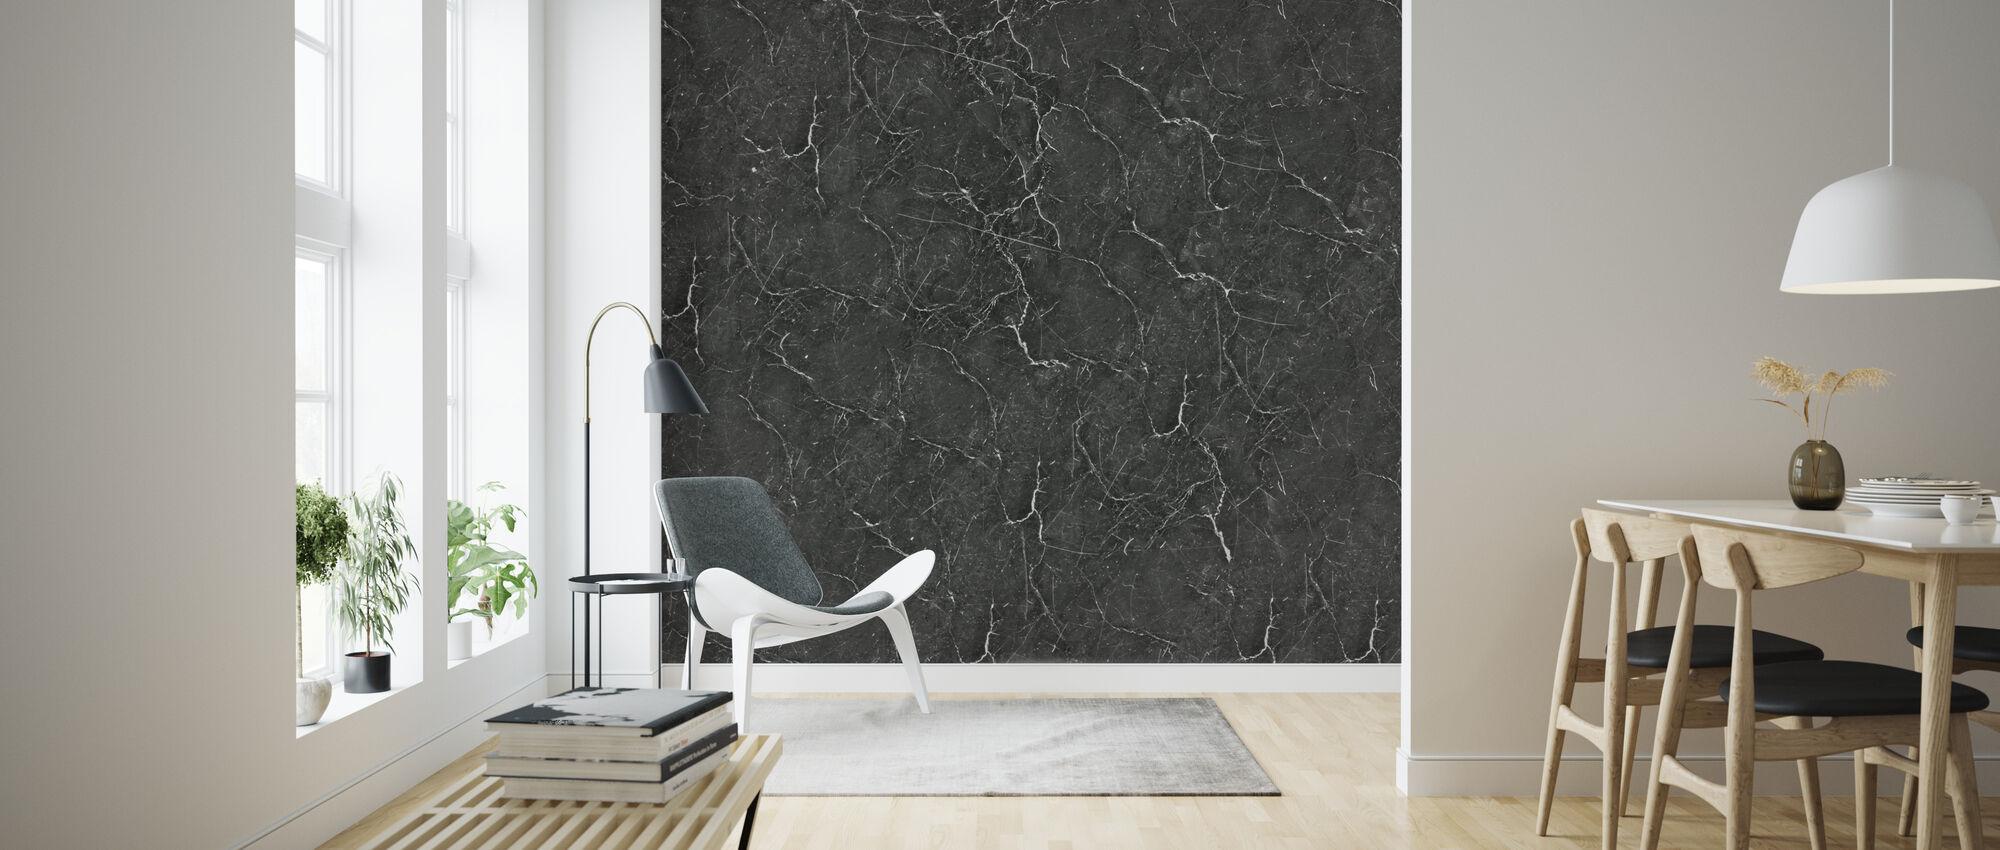 Sort Marmor - Tapet - Stue